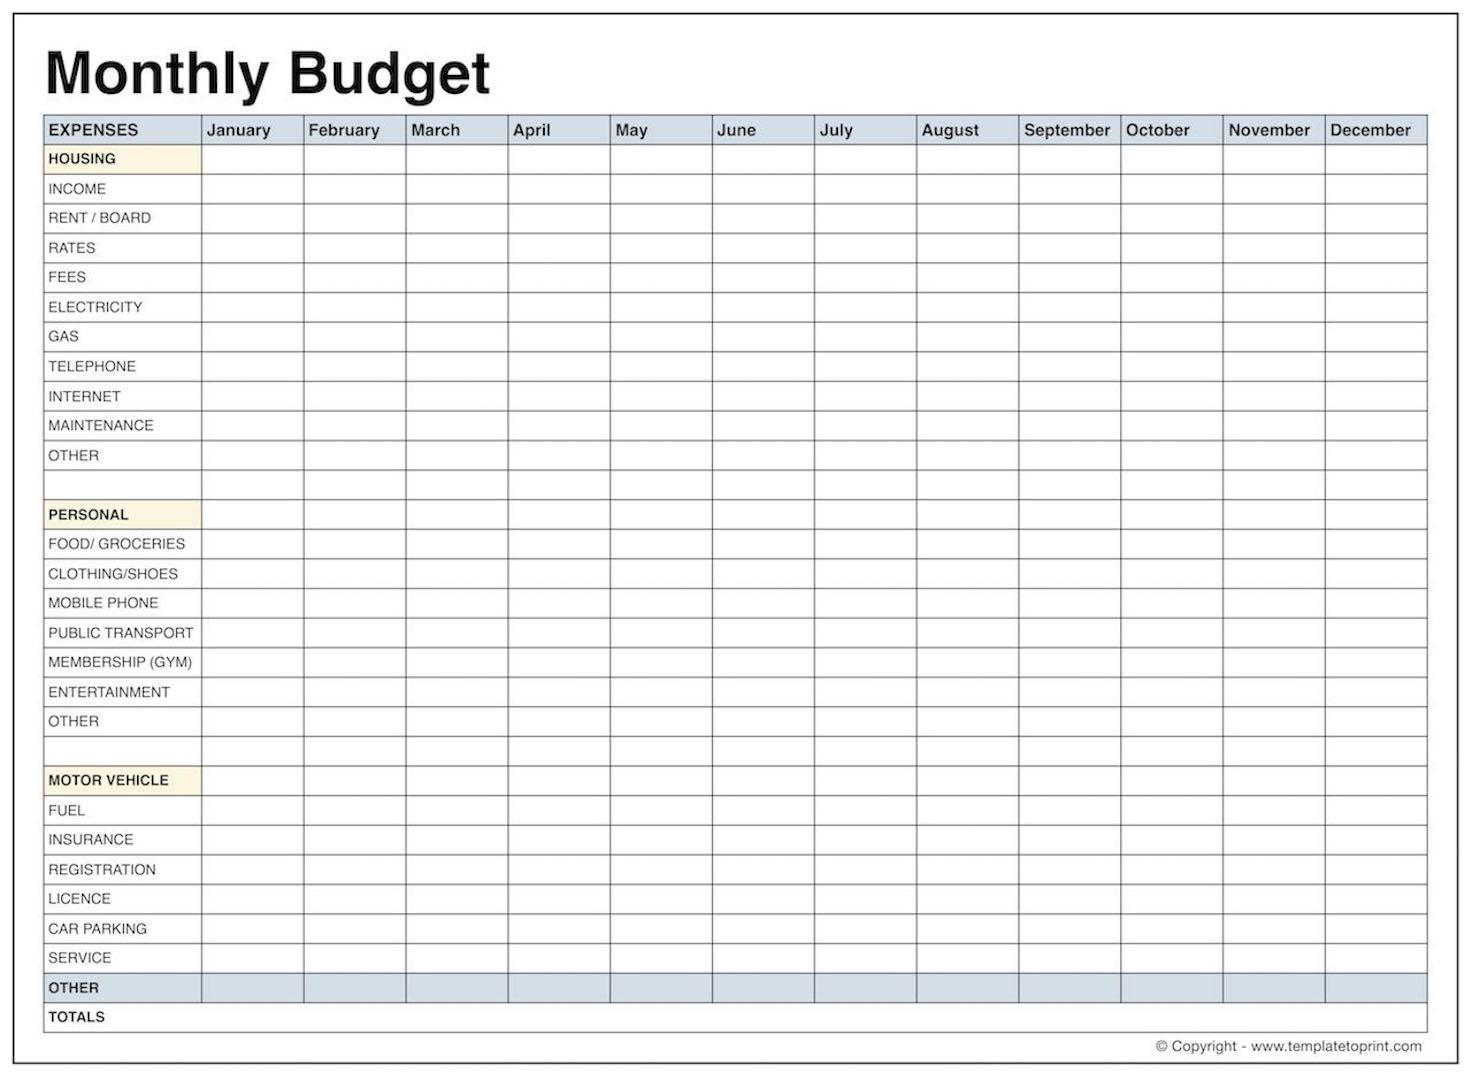 Printable Budget Worksheets Pdf Personal Spreadsheet Worksheet File Within Monthly Budget Spreadsheet